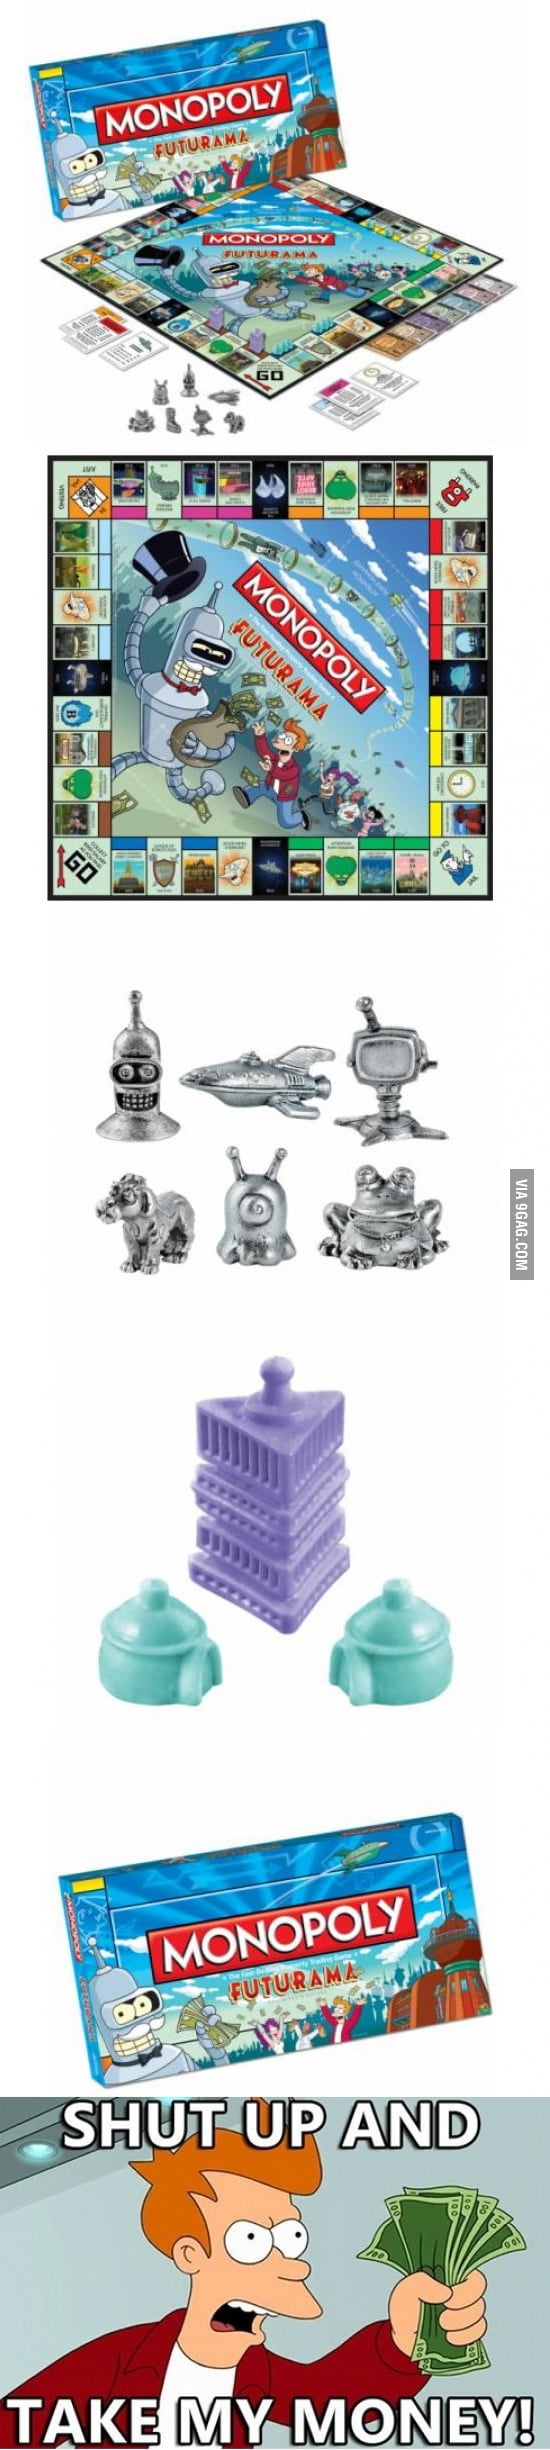 Monopoly Futurama